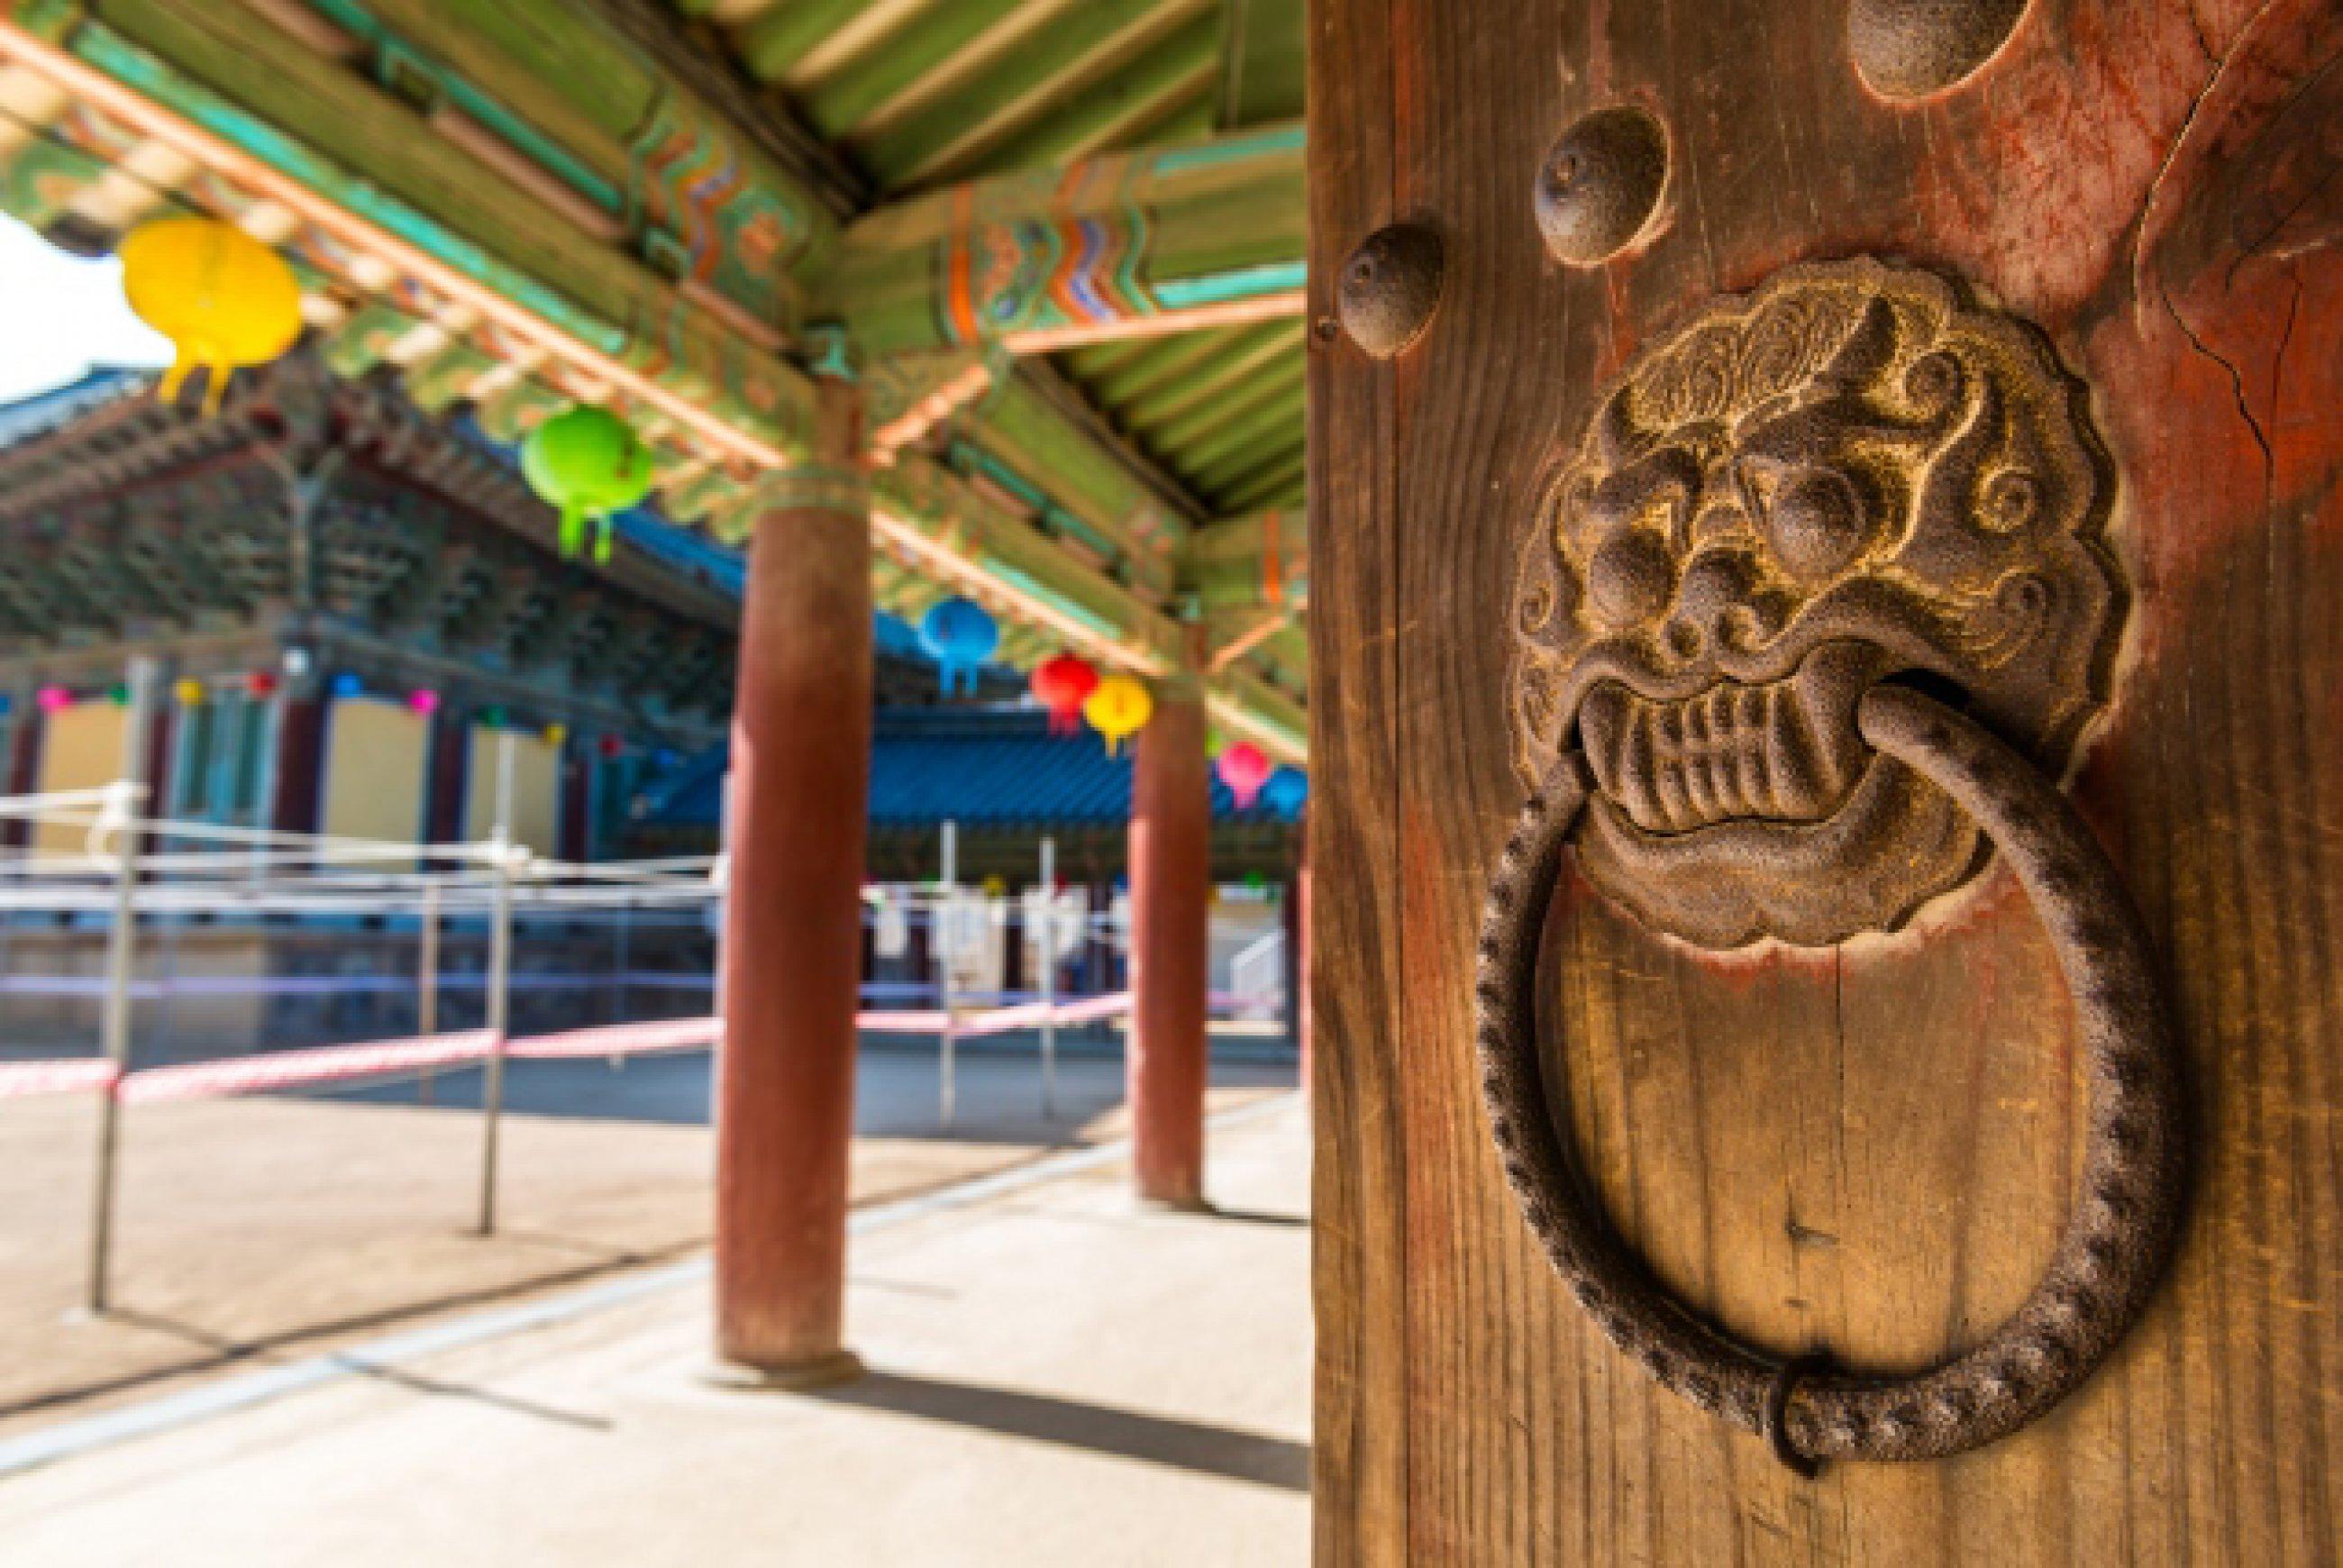 https://bubo.sk/uploads/galleries/7452/an-ornate-door-knocker-at-bulguksa-temple-in-gyeongju-south-korea.jpg